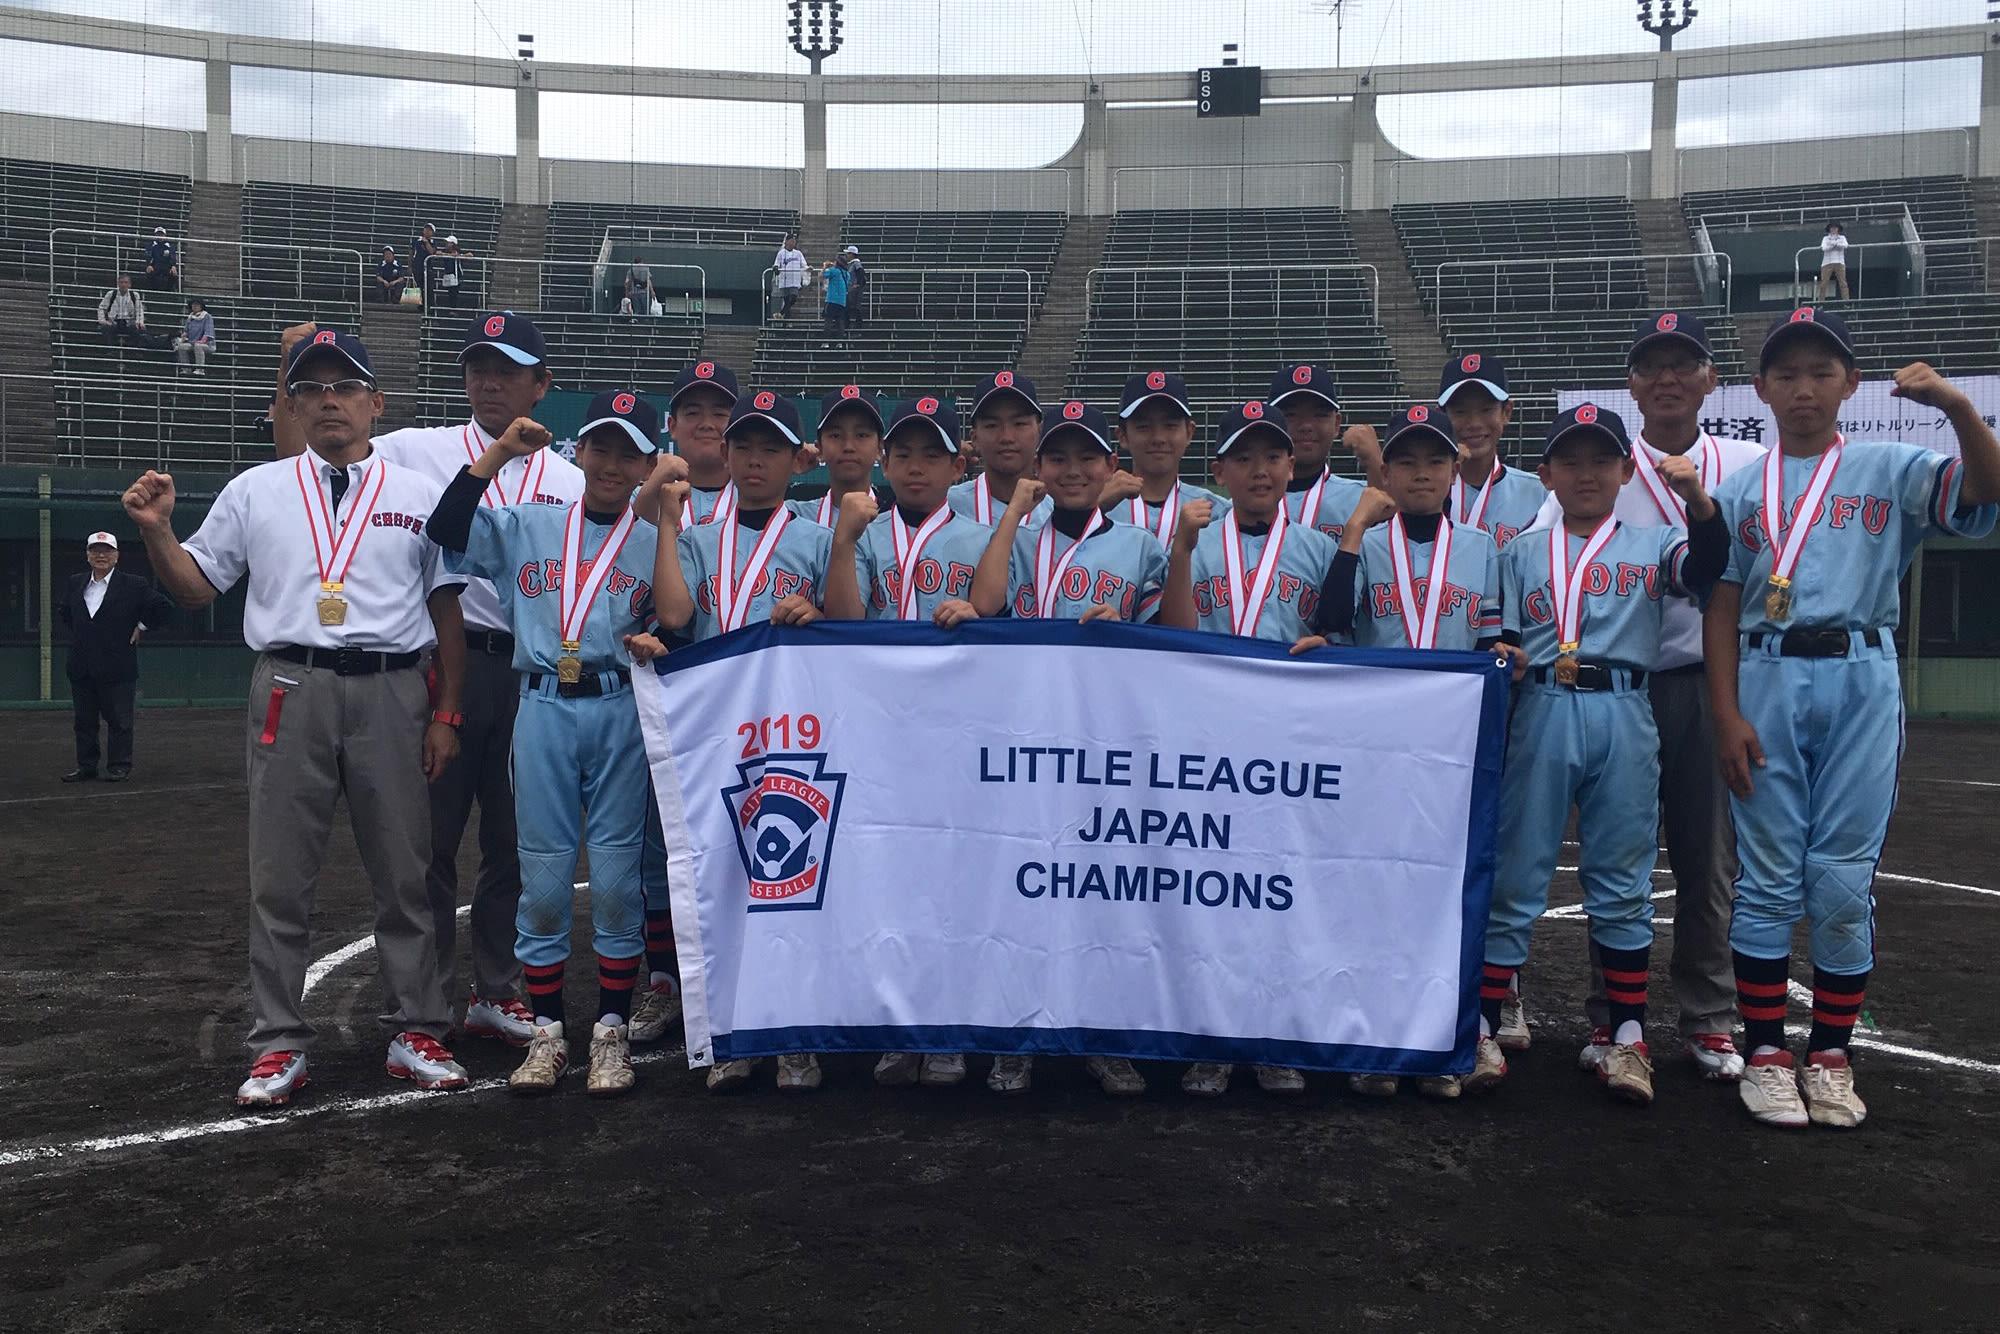 2019 LLB Japan Region Champions